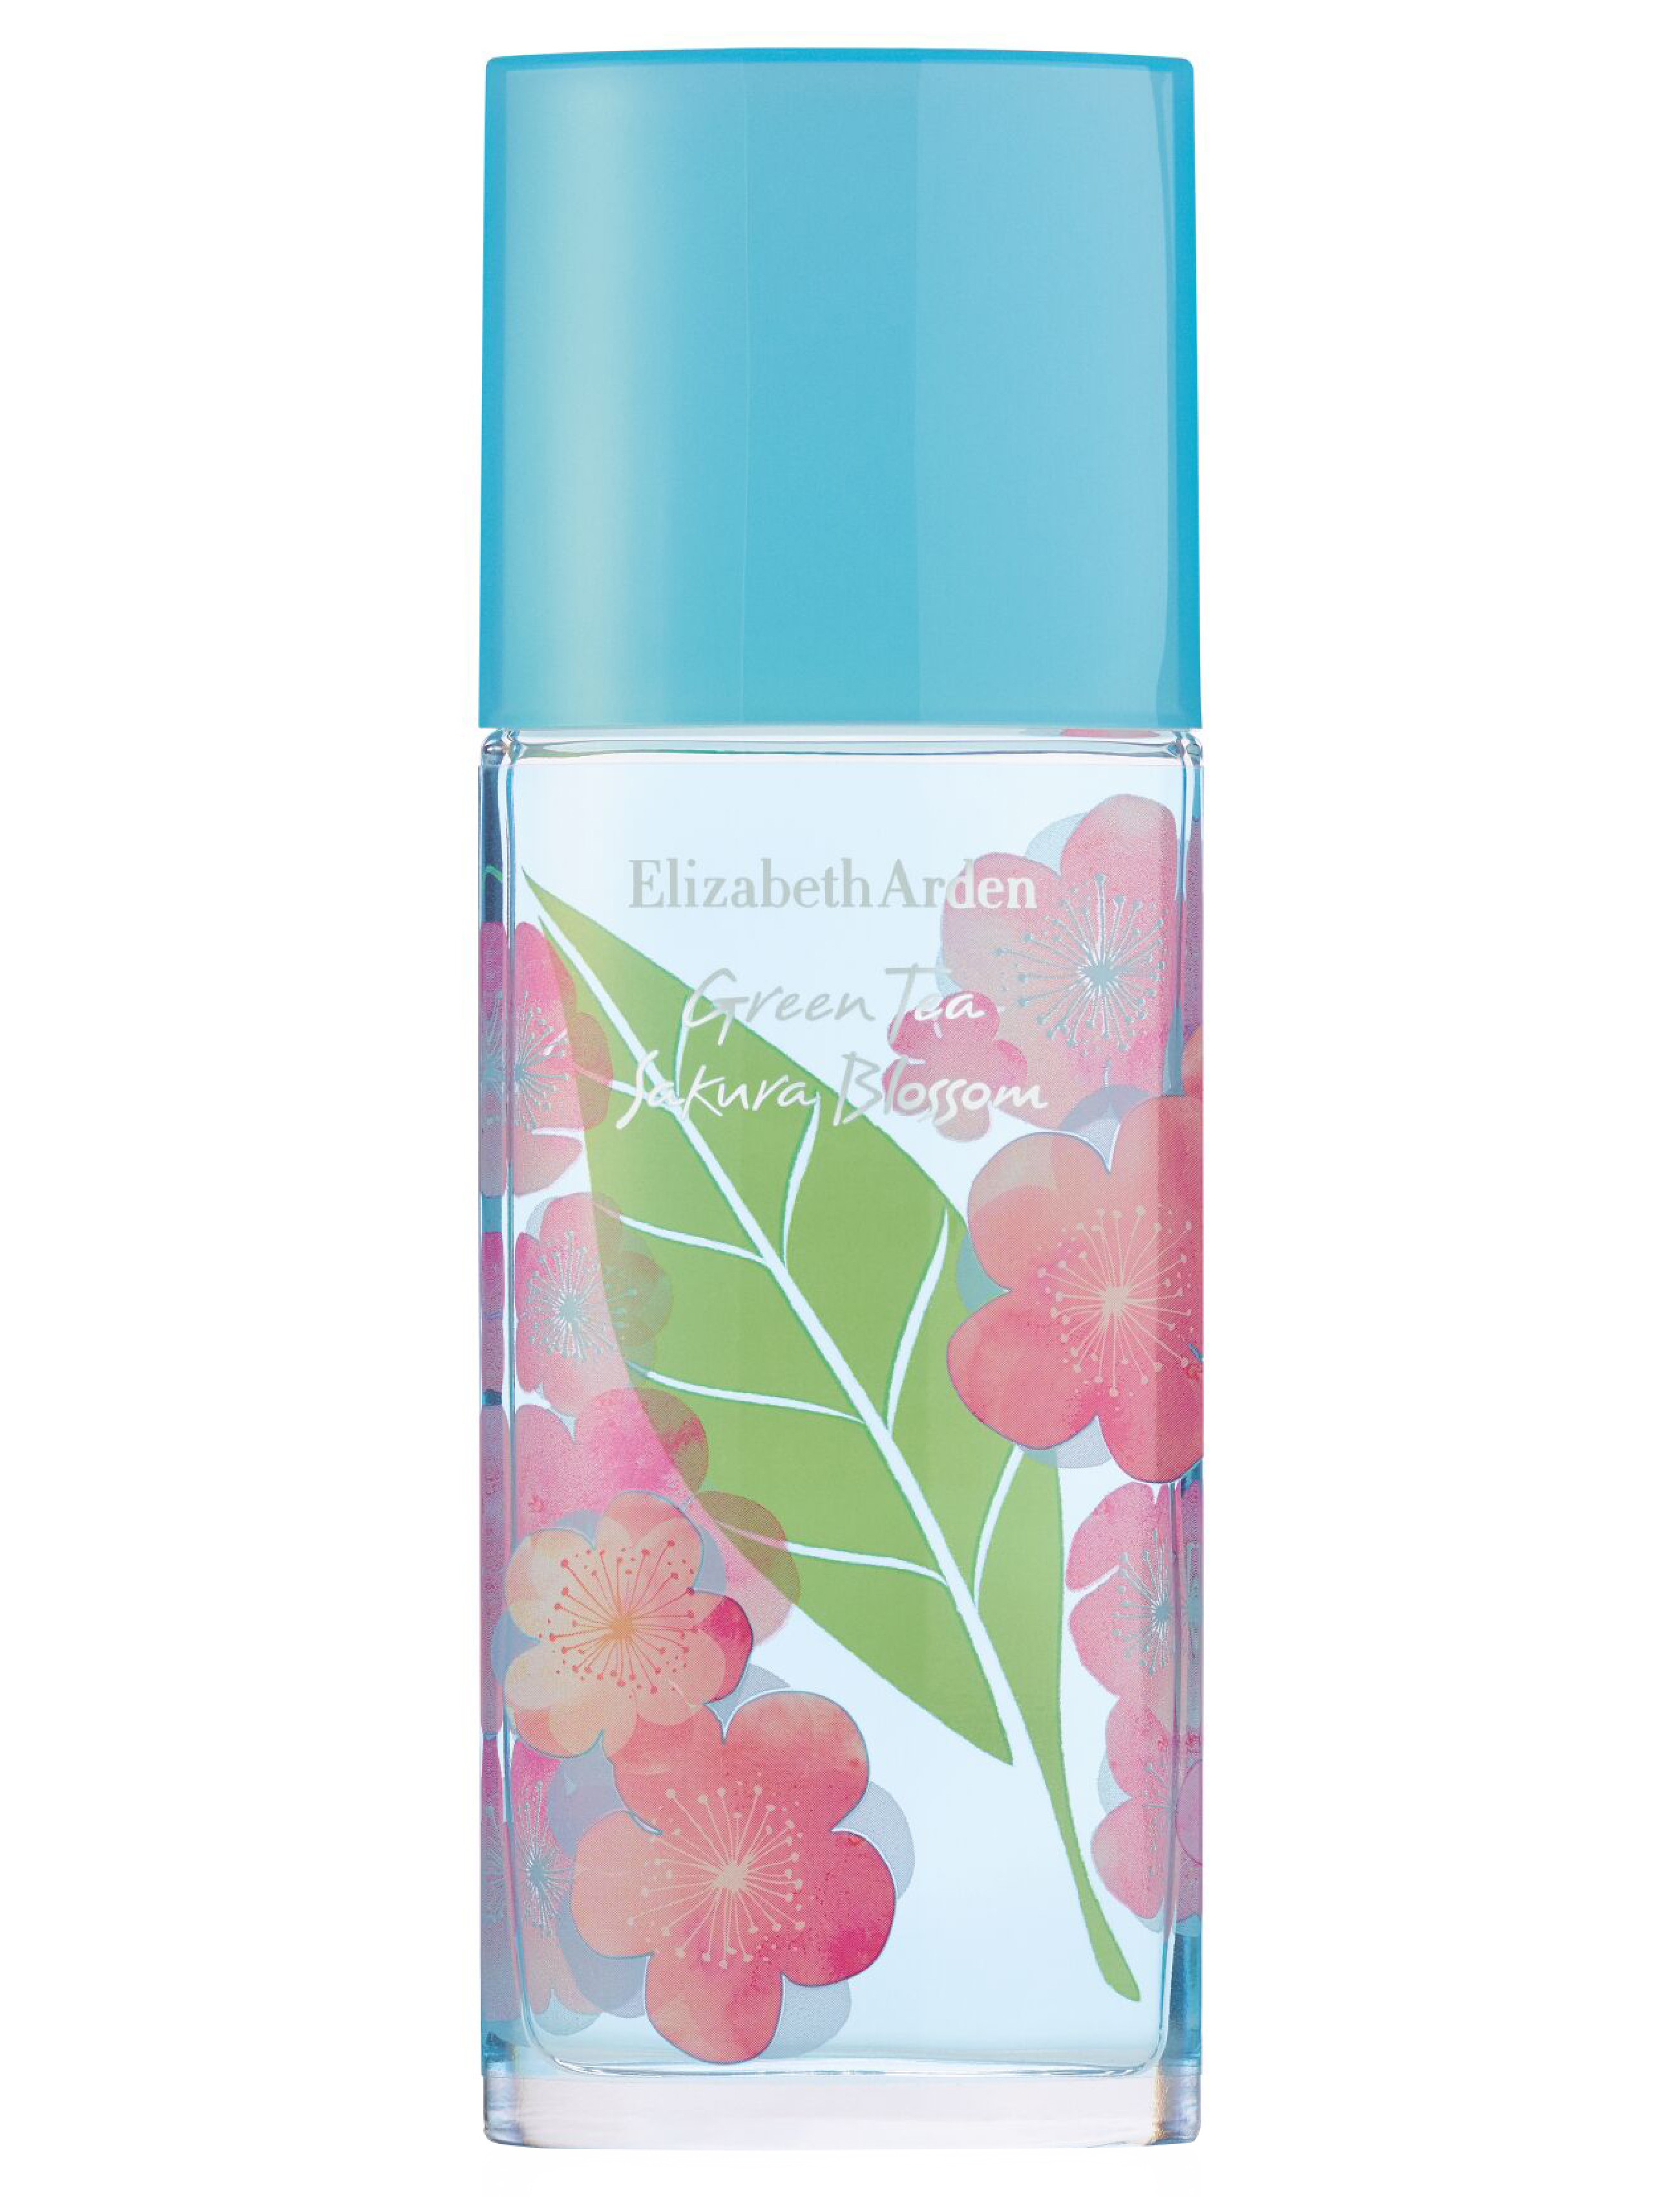 Elizabeth Arden Green Tea Sakura Blossom EDT